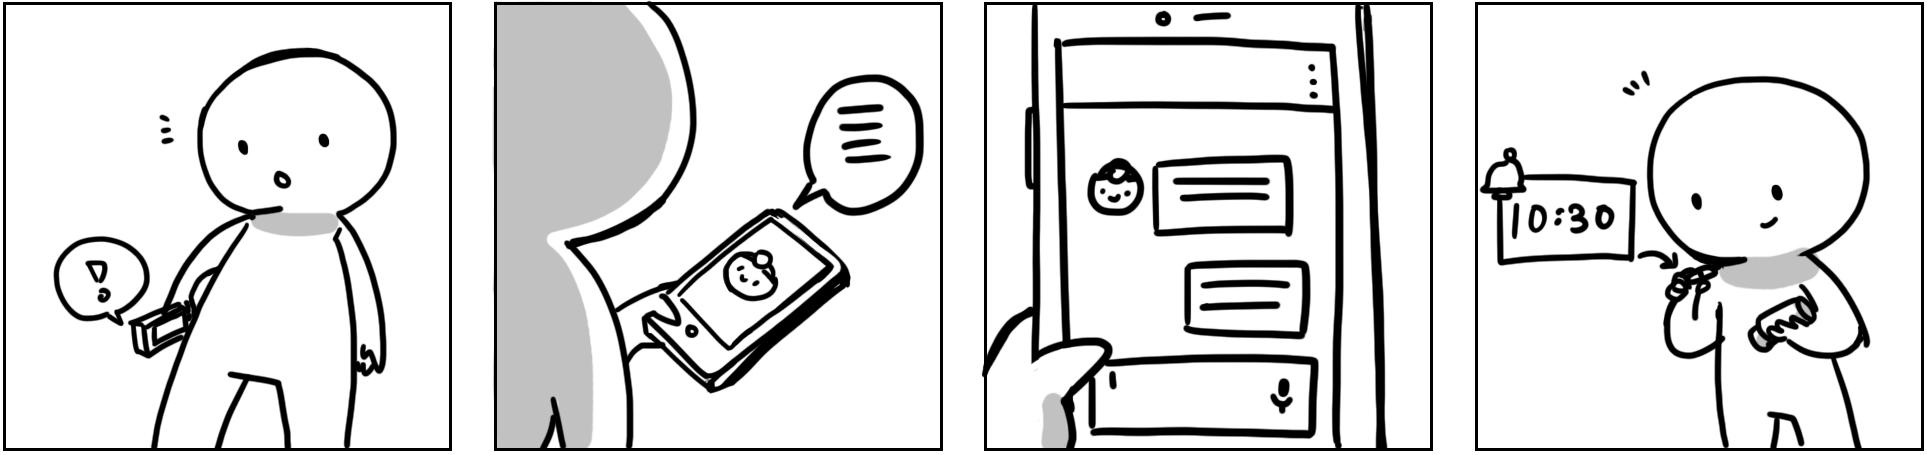 Storyboard_chatbot.jpg